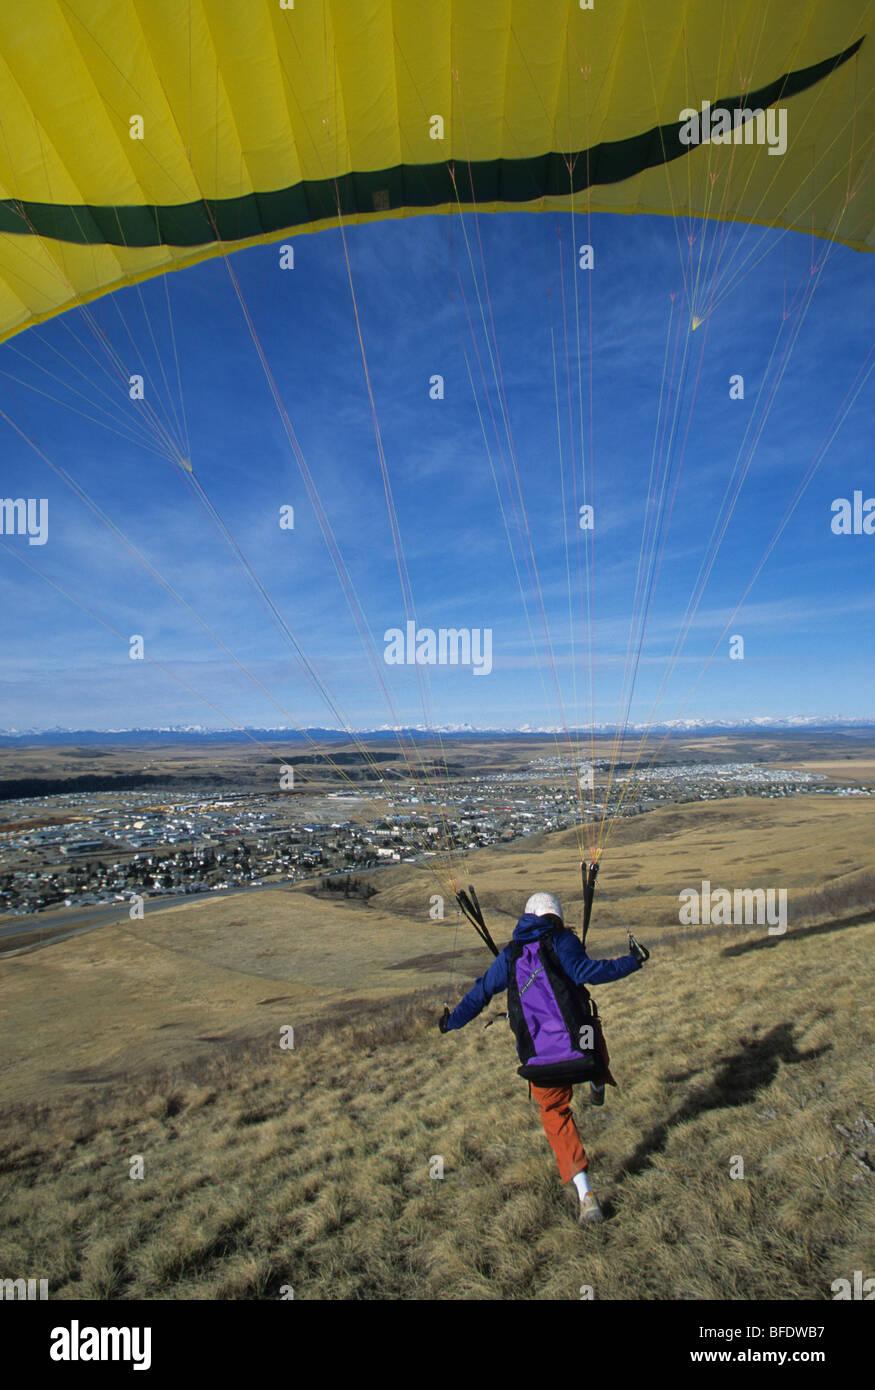 A paraglider landing on a grassy field in Cochrane, Alberta, Canada Stock Photo